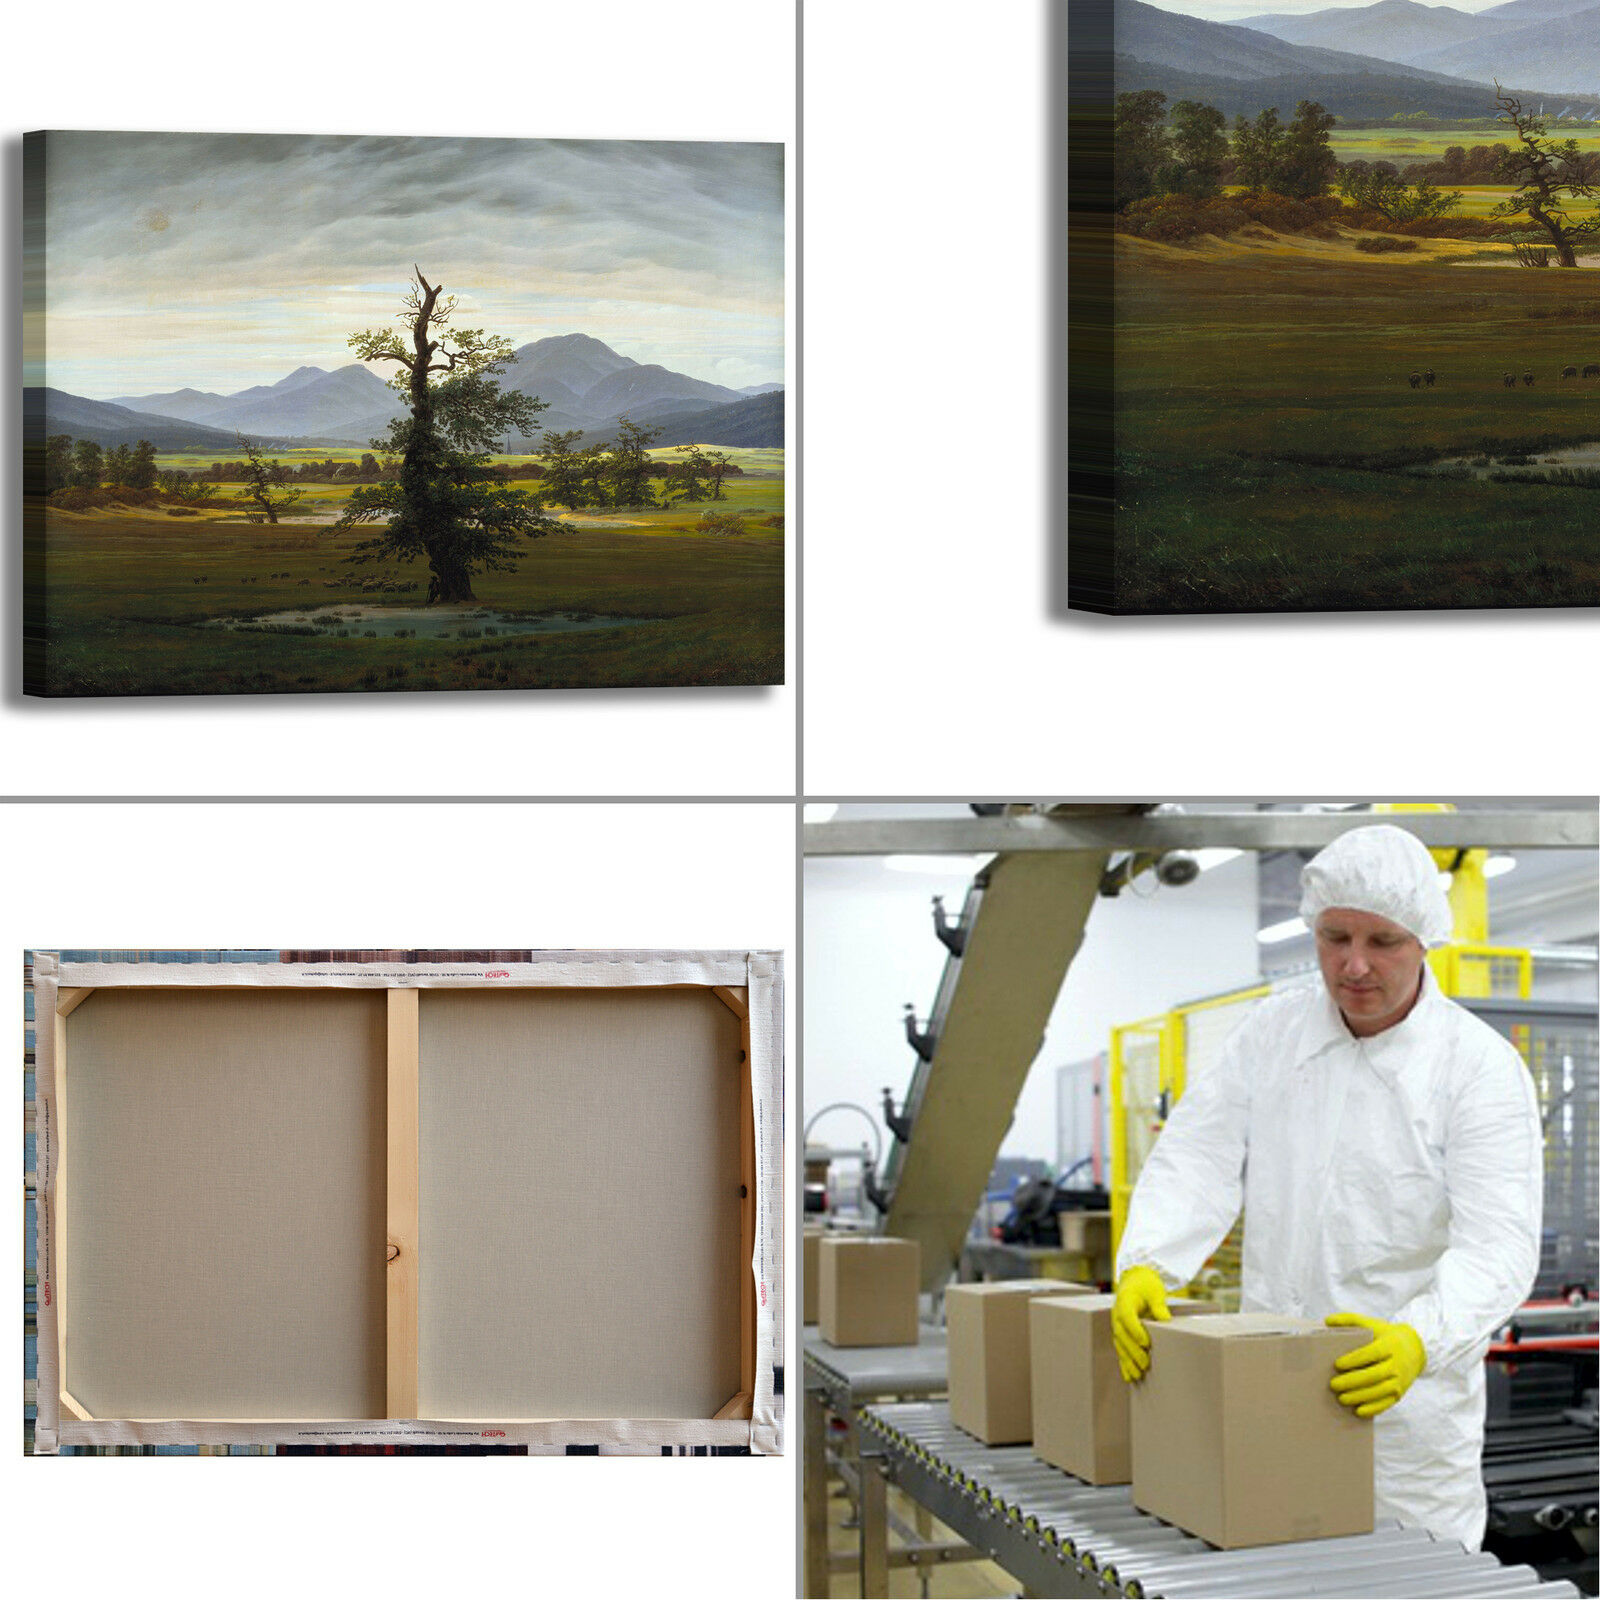 Caspar albero albero Caspar solitario design quadro stampa tela dipinto telaio arRouge o casa a30748